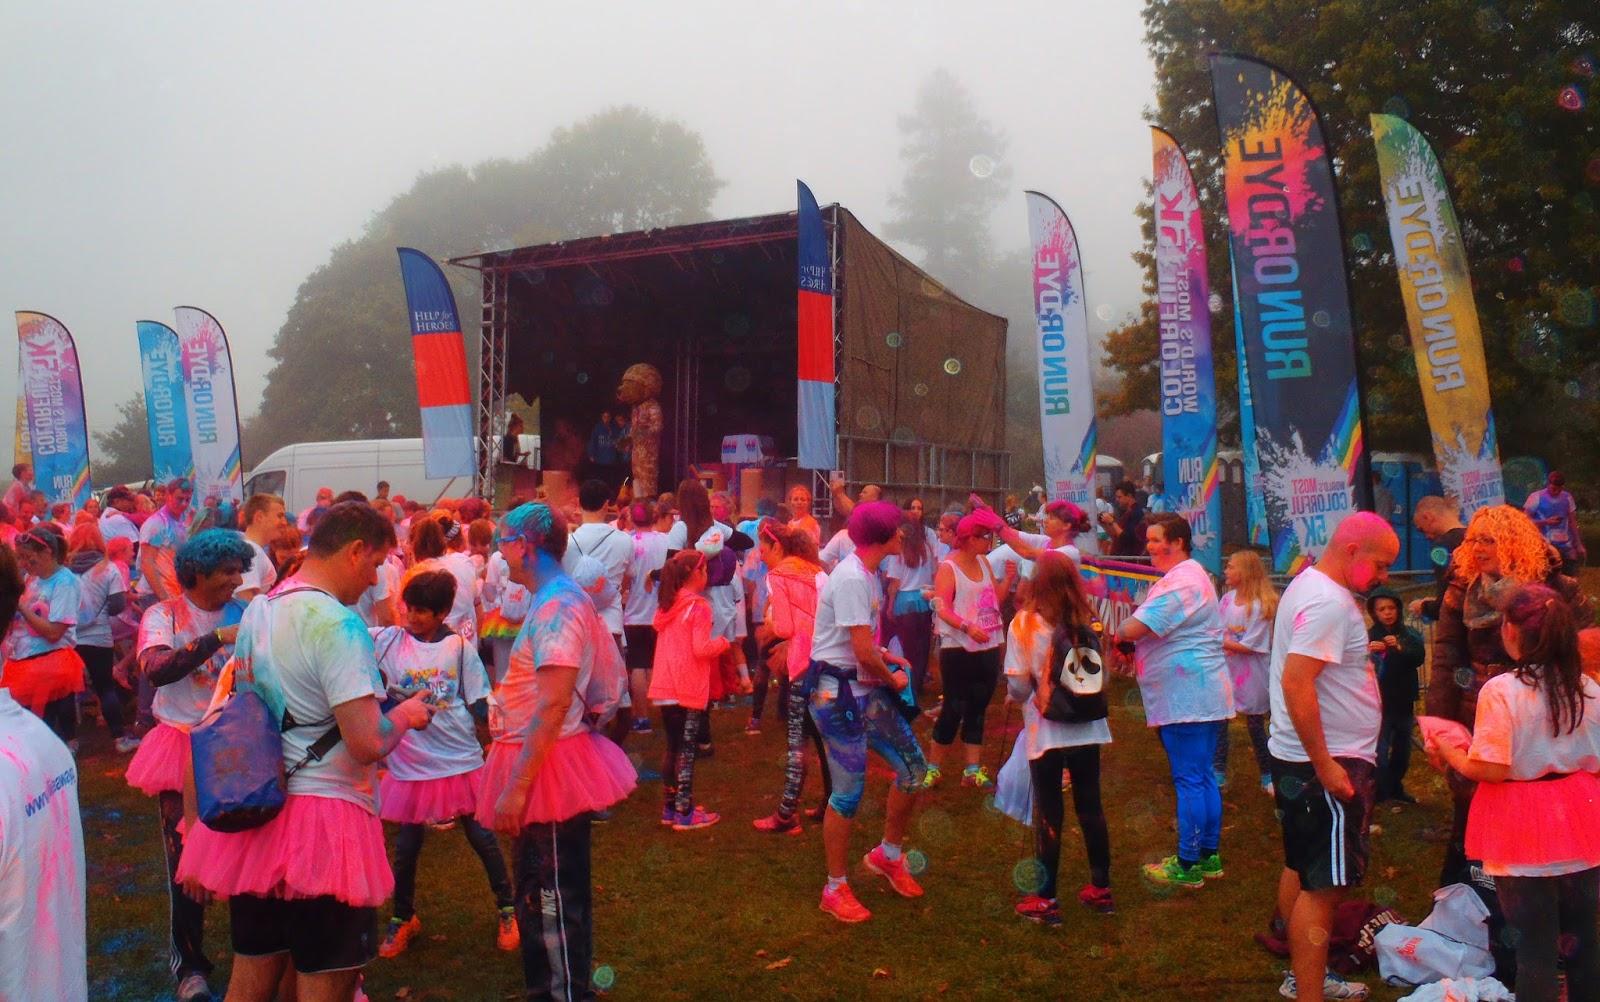 Run or Dye at Hever Castle